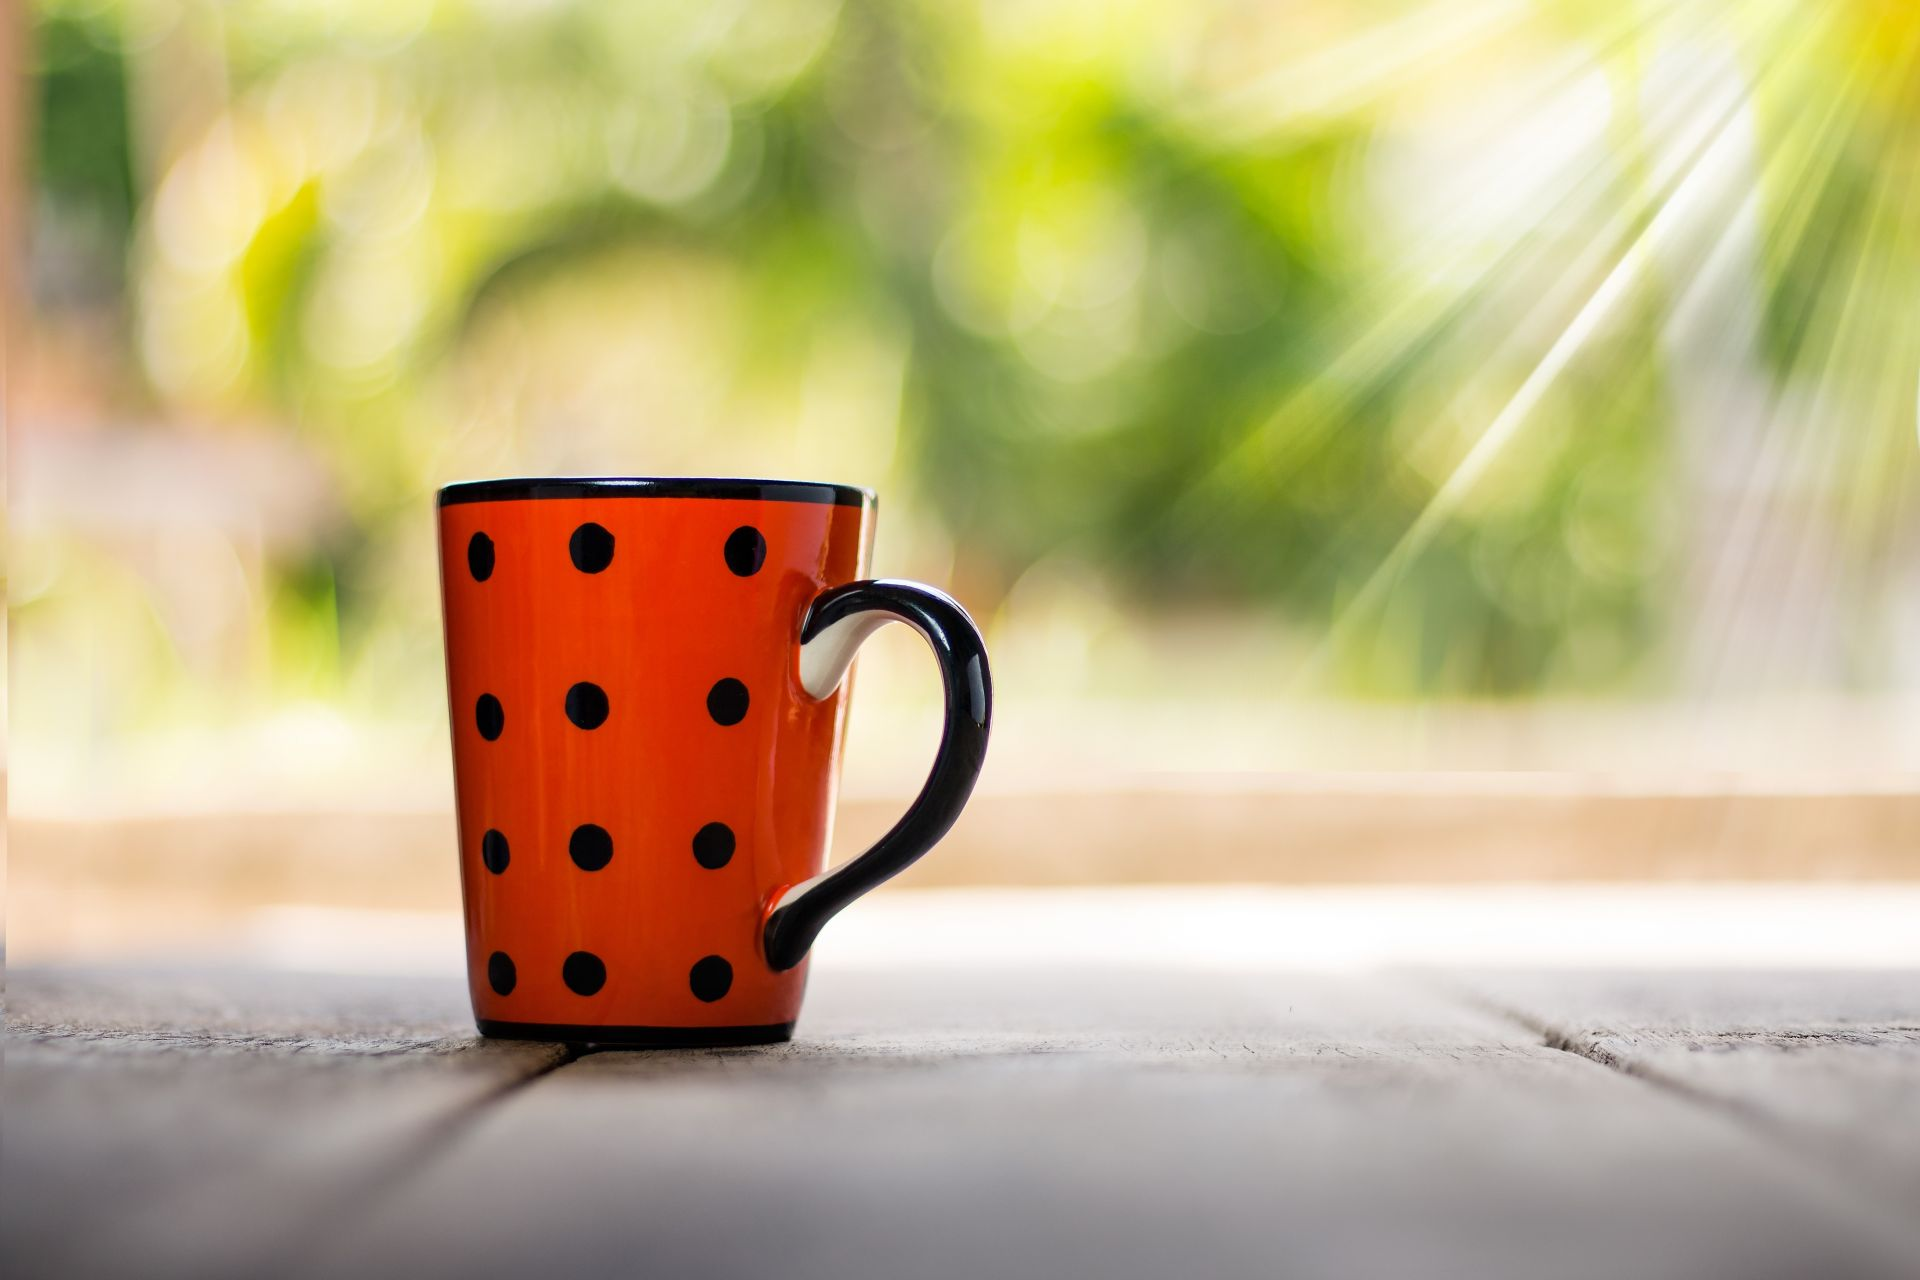 Kahvikuppi kylpee auringon valossa.